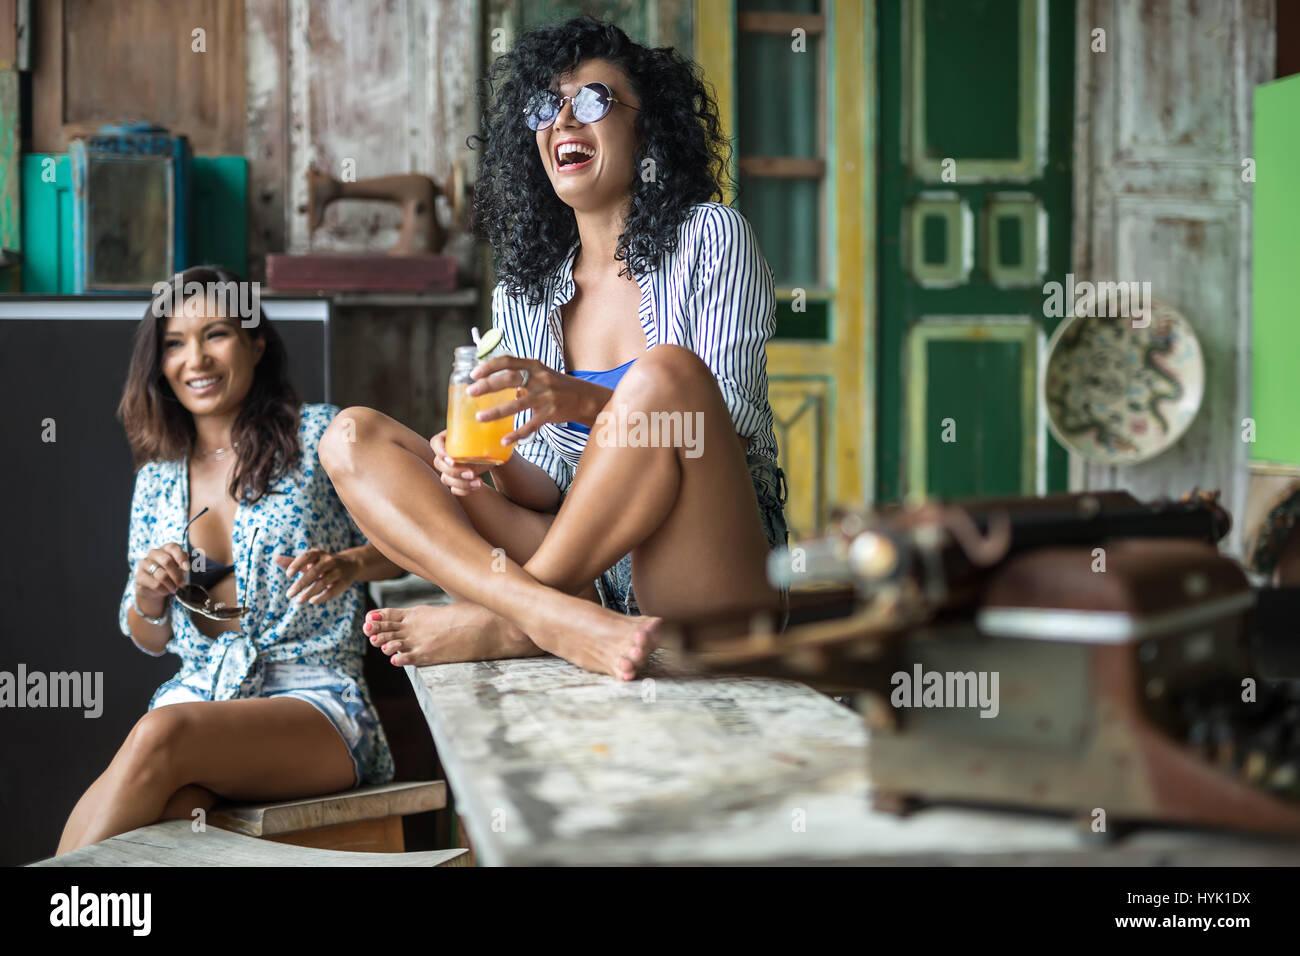 Asian girls in bar - Stock Image